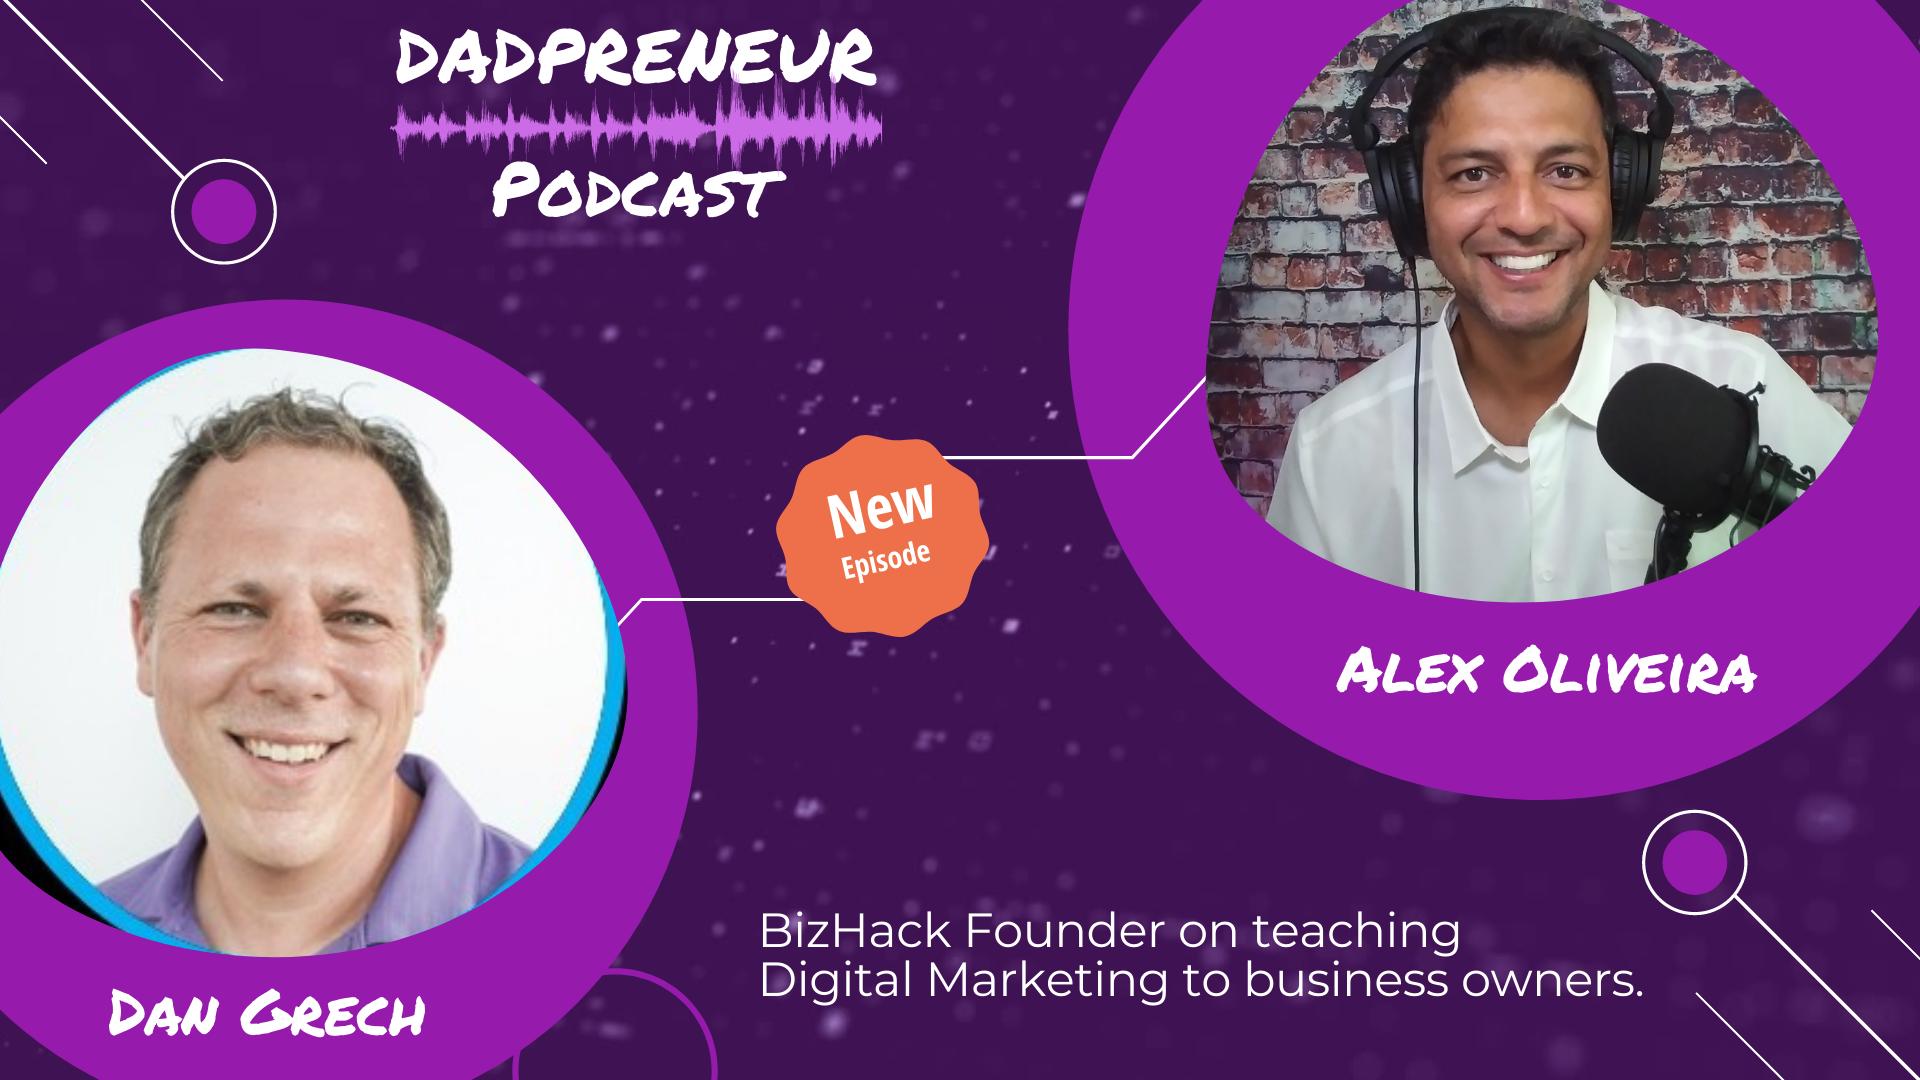 Meet Dan Grech! A Digital Marketing Educator